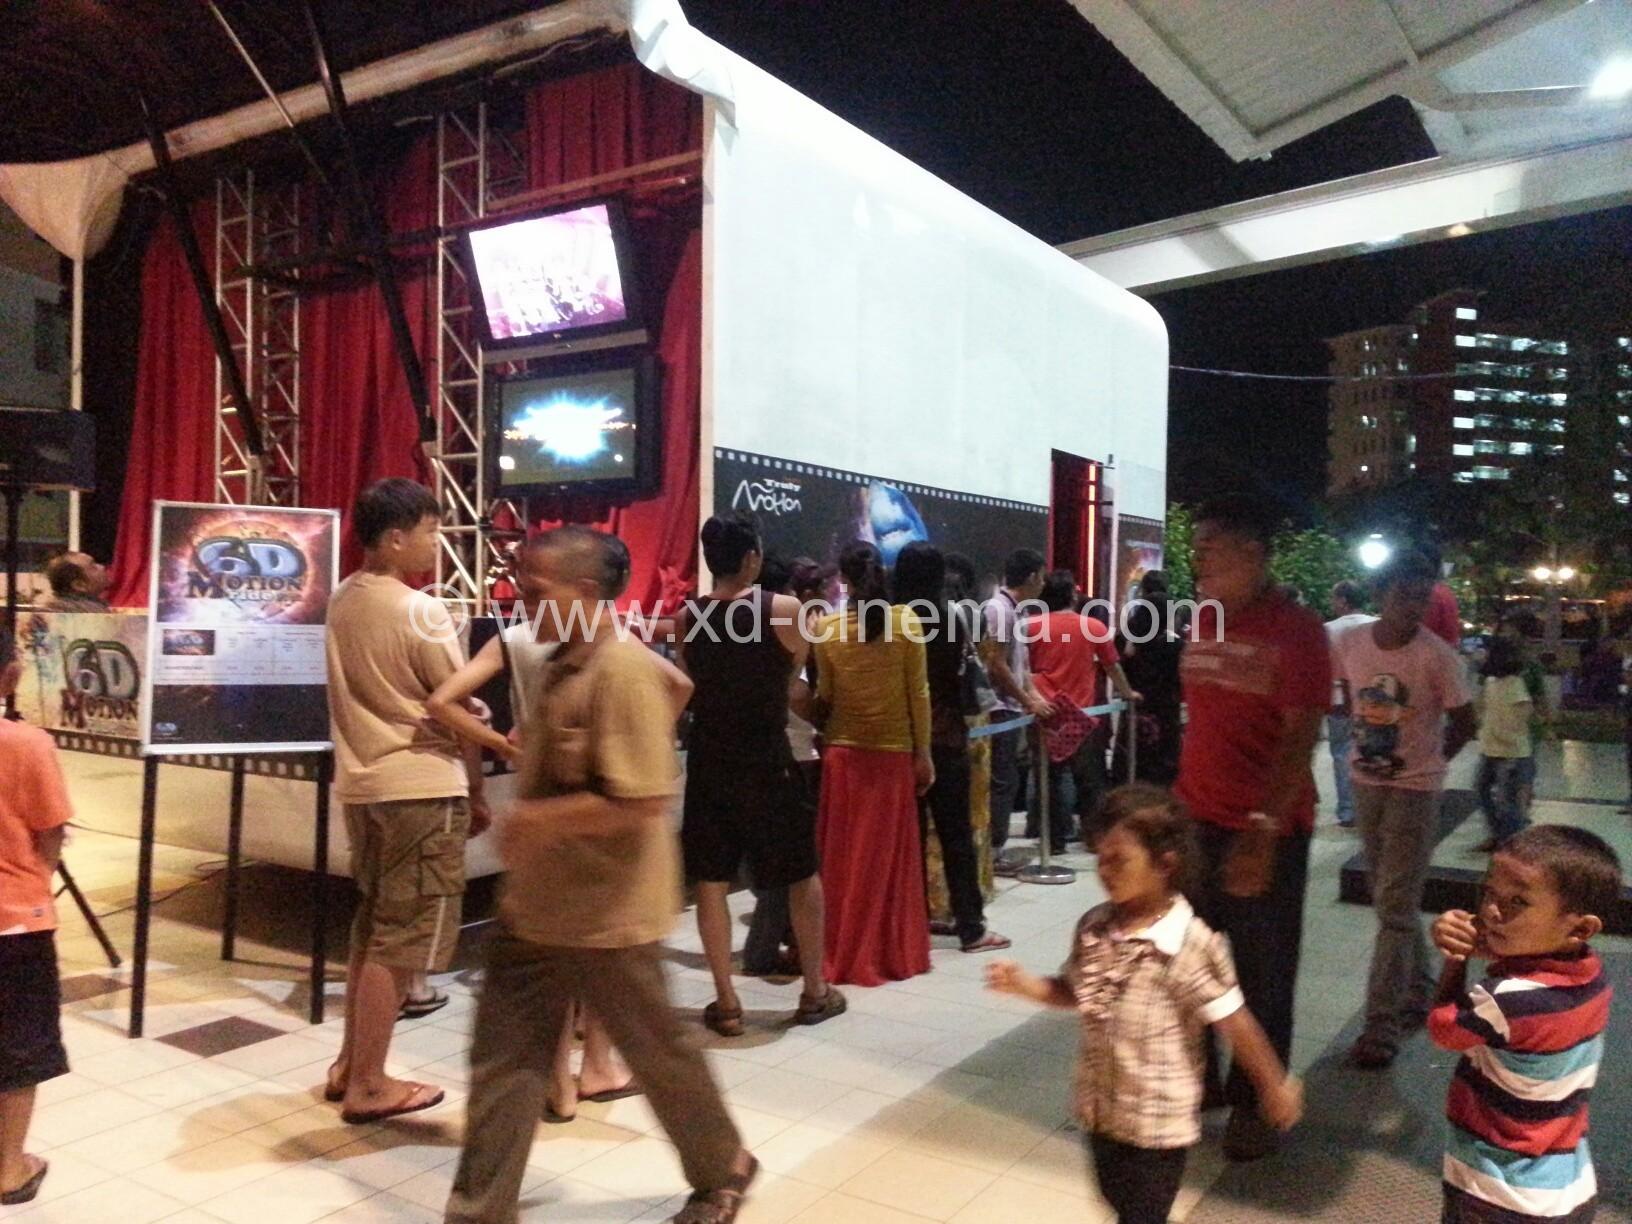 Malaysia-5D-cinema